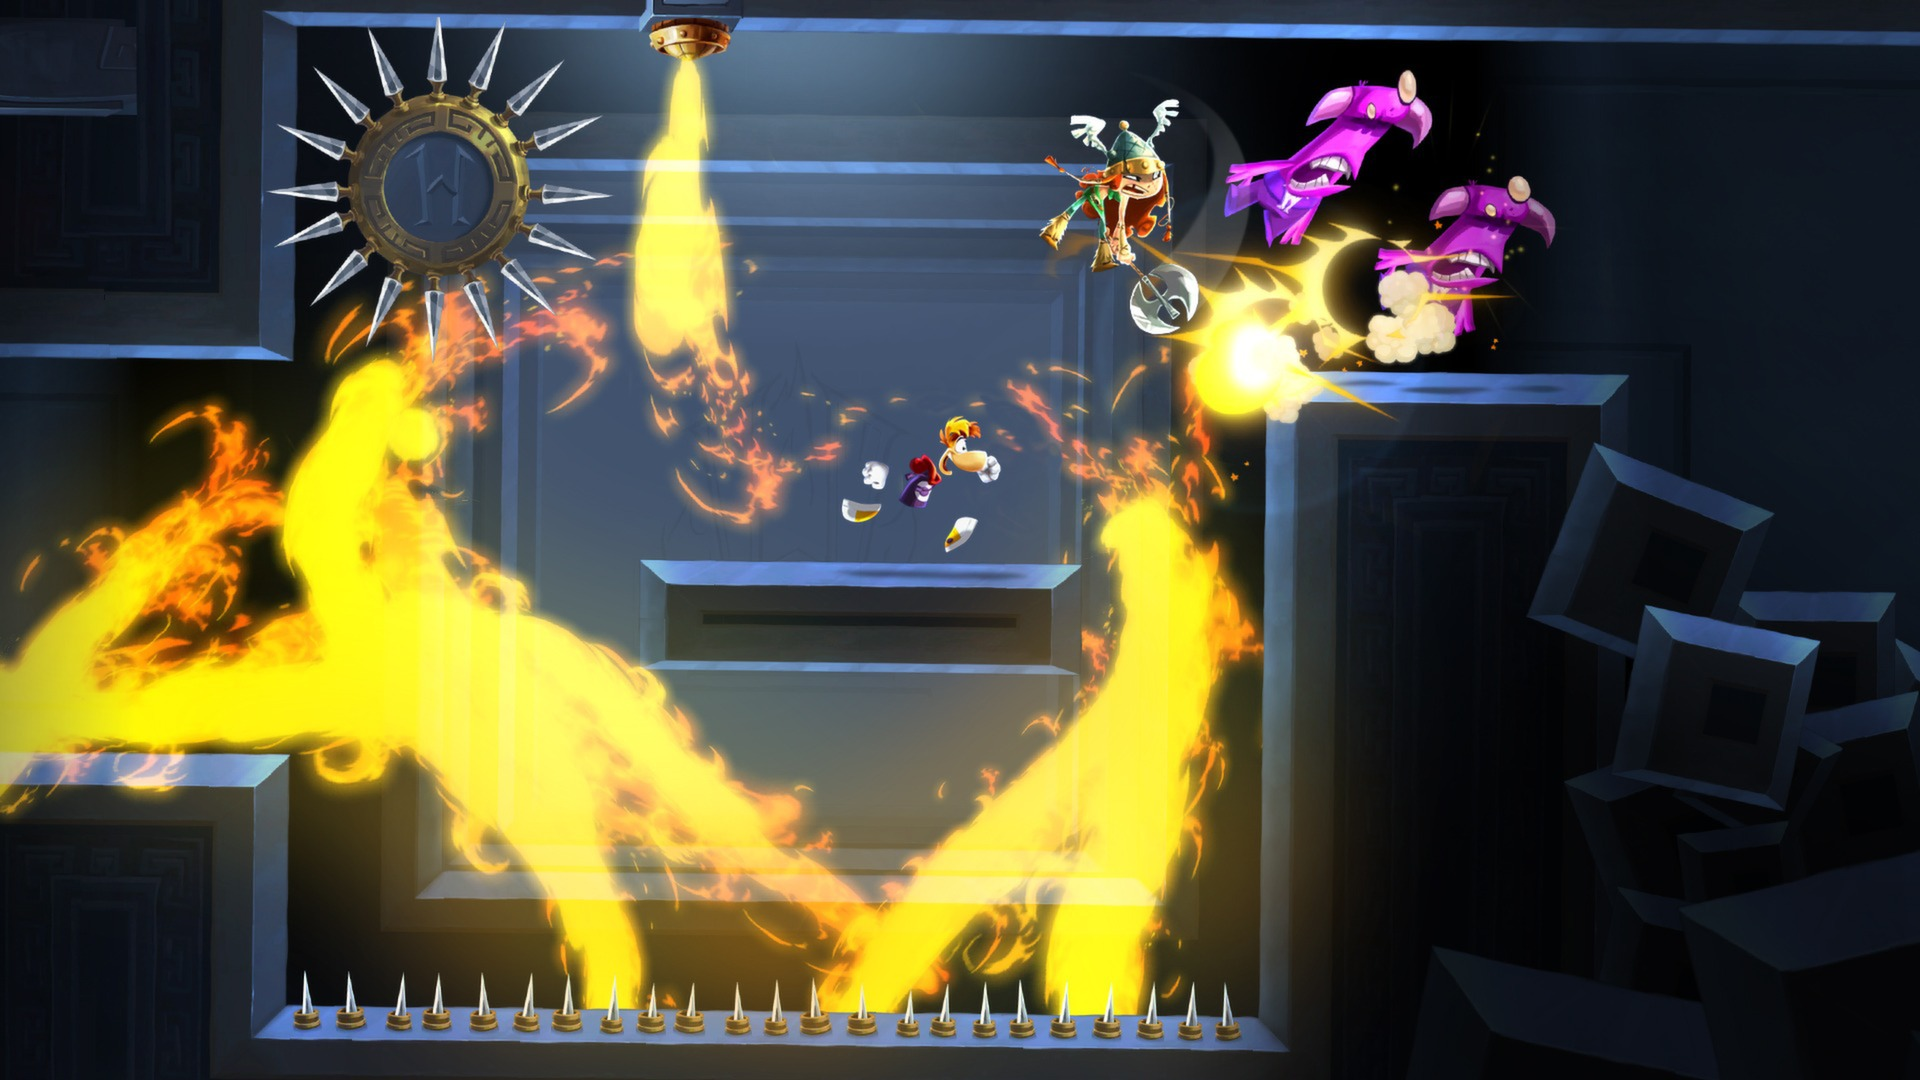 <em>Rayman Legends</em> is one of the finest 2D platformers of the 2010s.